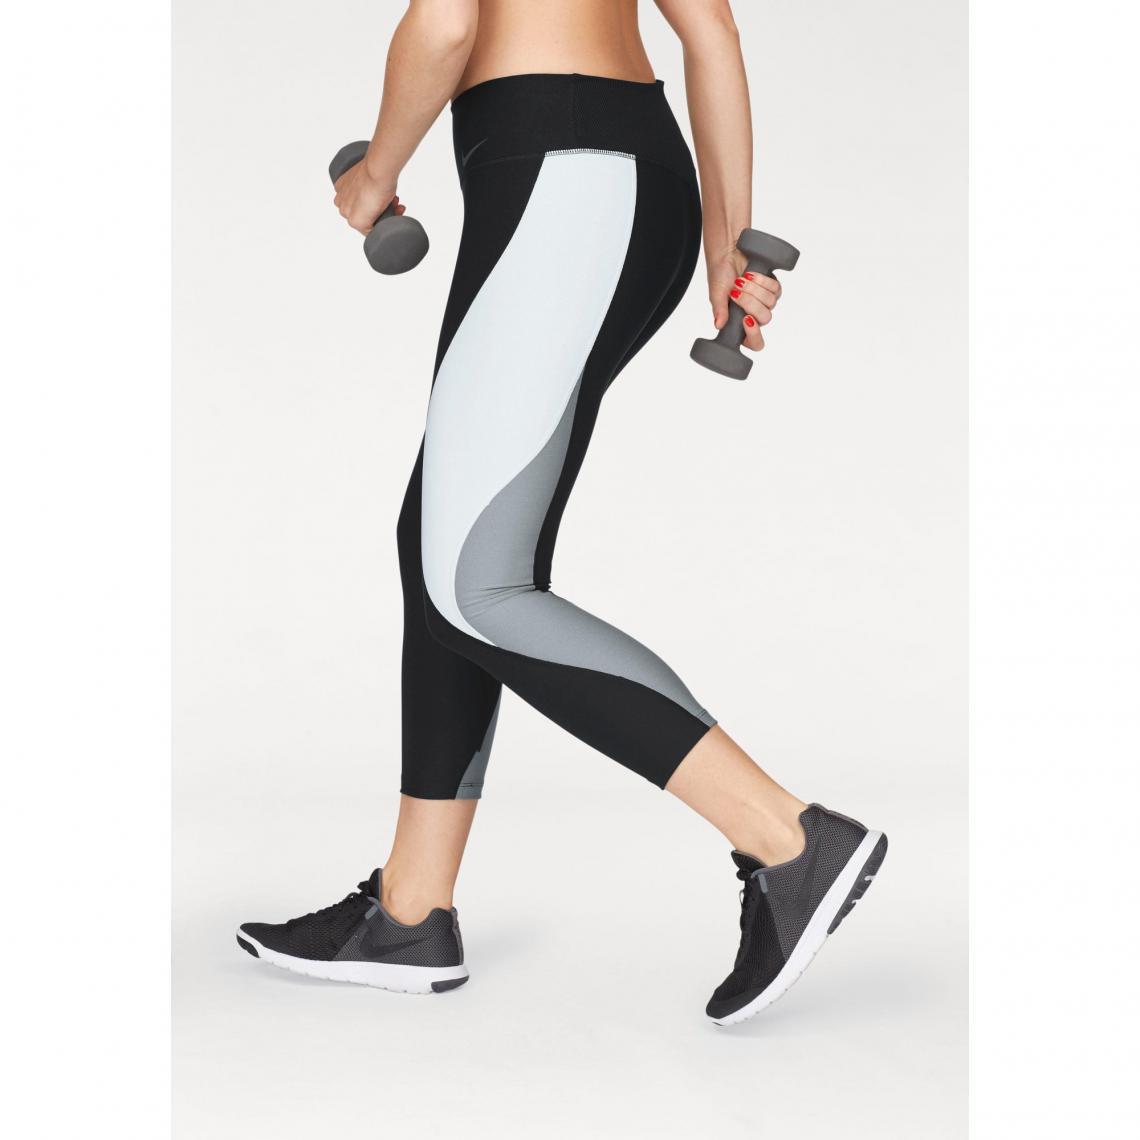 Colorblock Tight 34 De Legging Sport Vnr Power Nike Femme Legend OZSUxvq